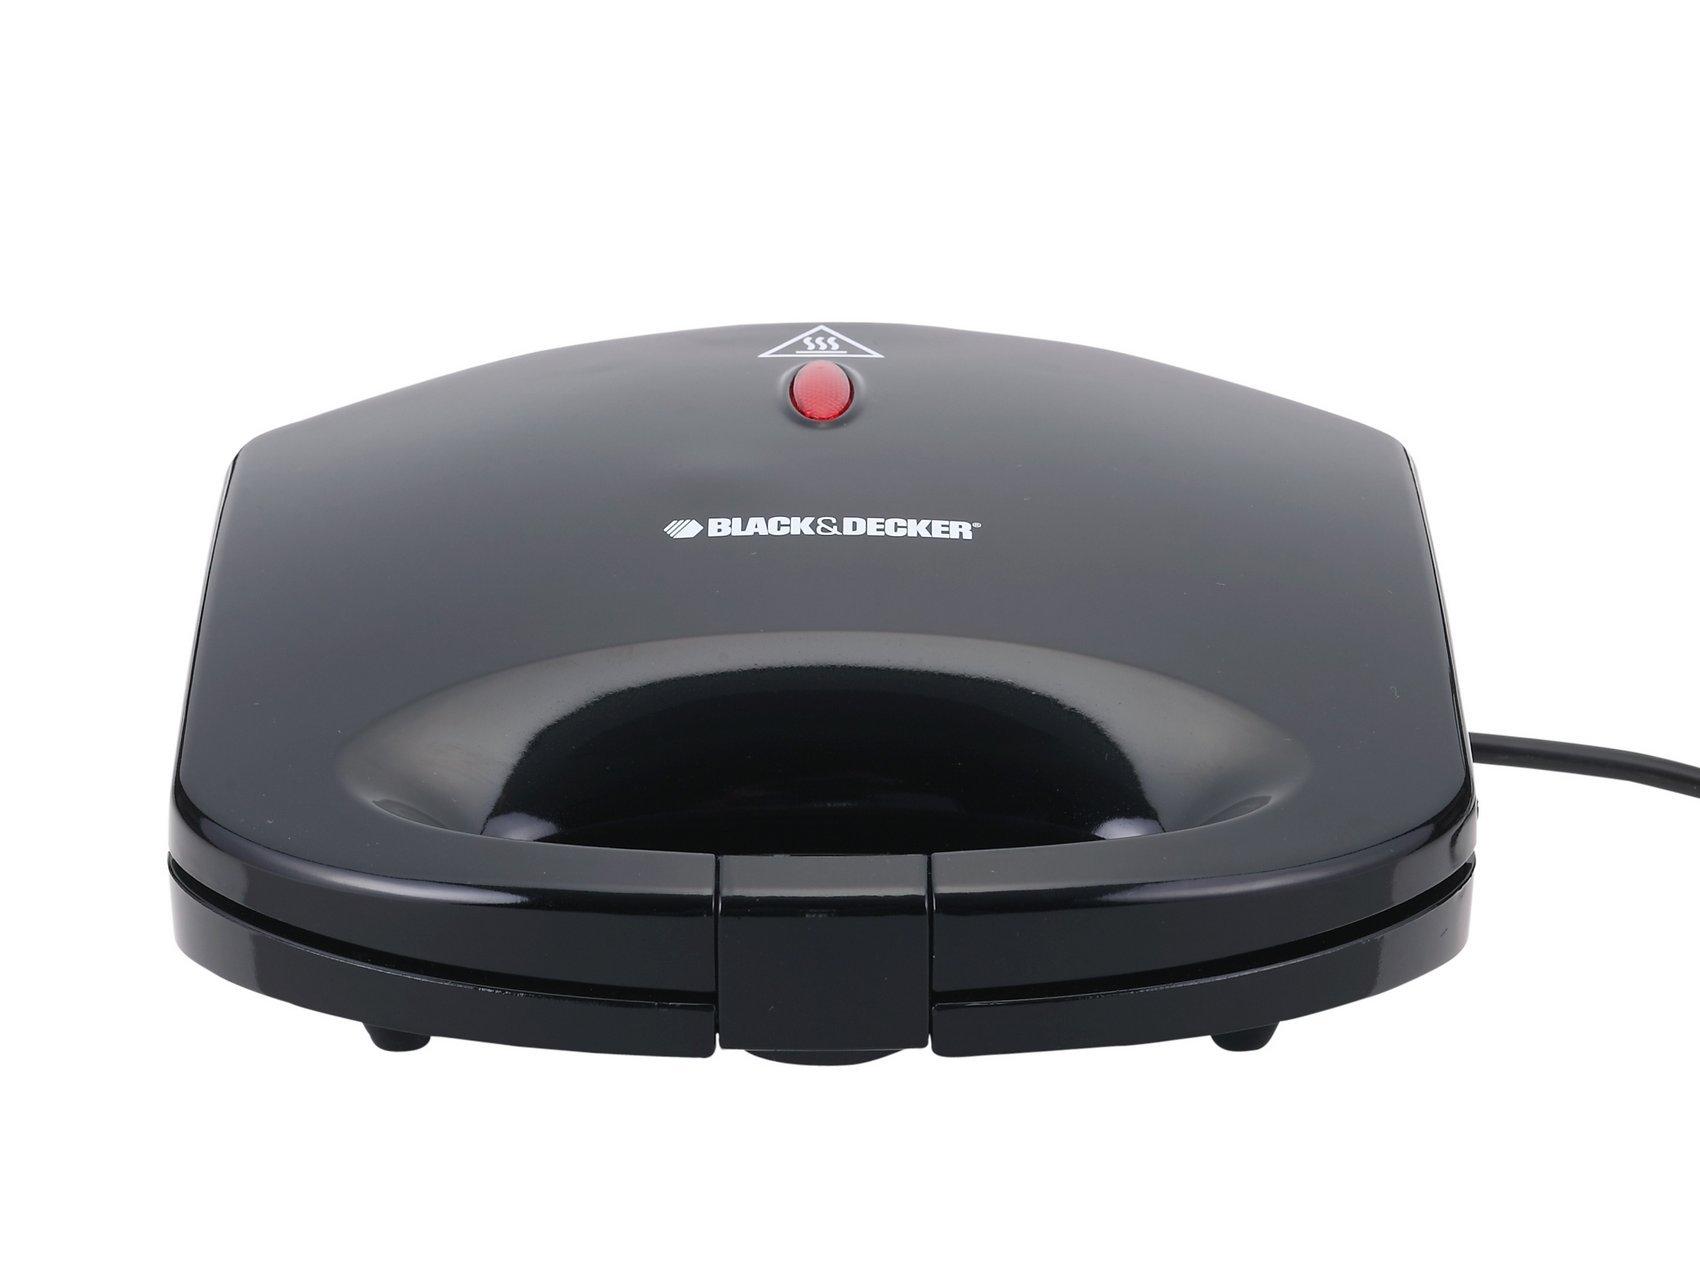 BLACK & DECKER TS 1000 220V Sandwich Maker 600W 220-240V (Not for USA), Black by BLACK+DECKER (Image #3)